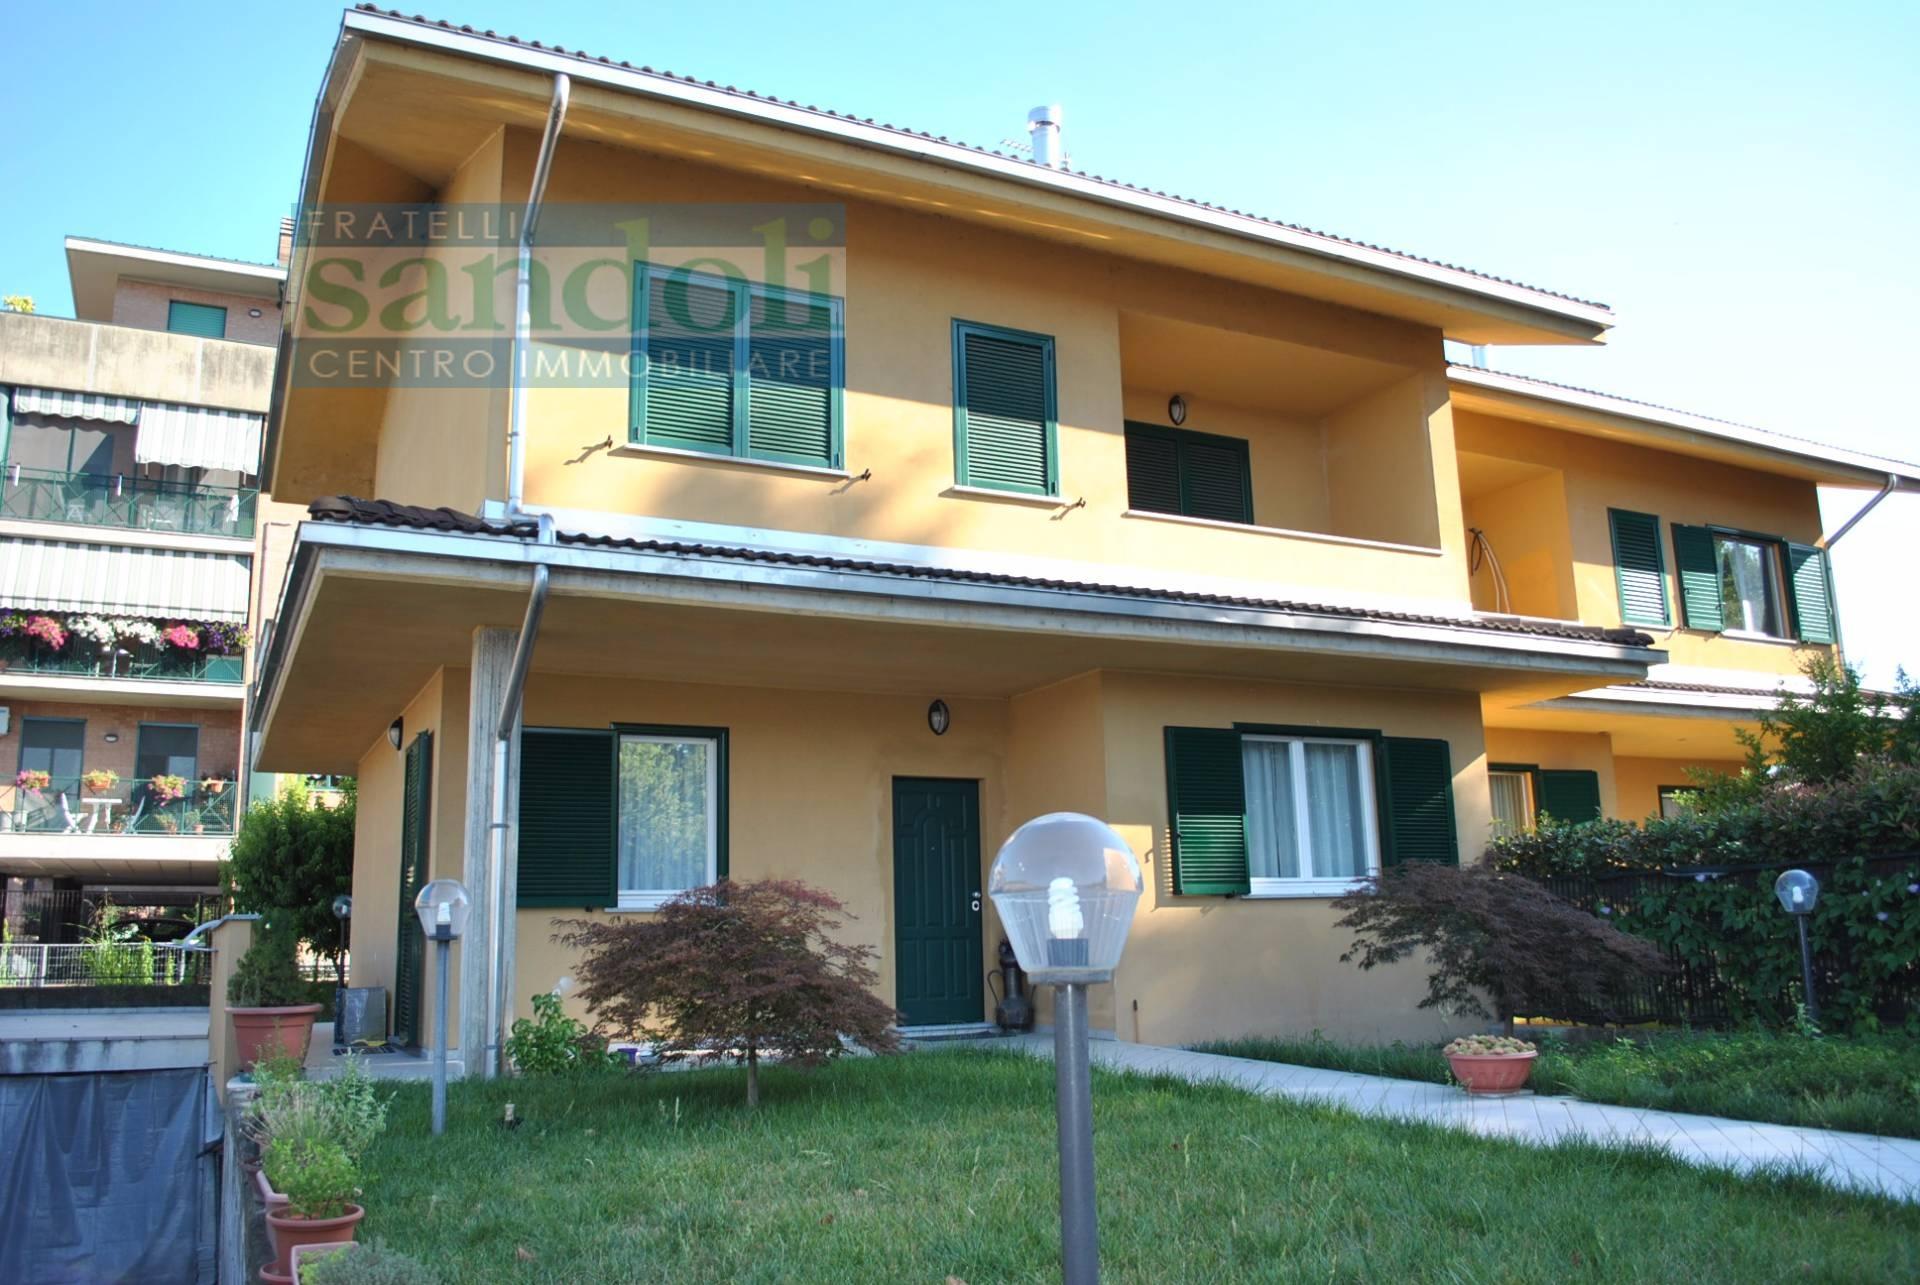 vendita casa indipendente vercelli 4 150  tratt. ris.